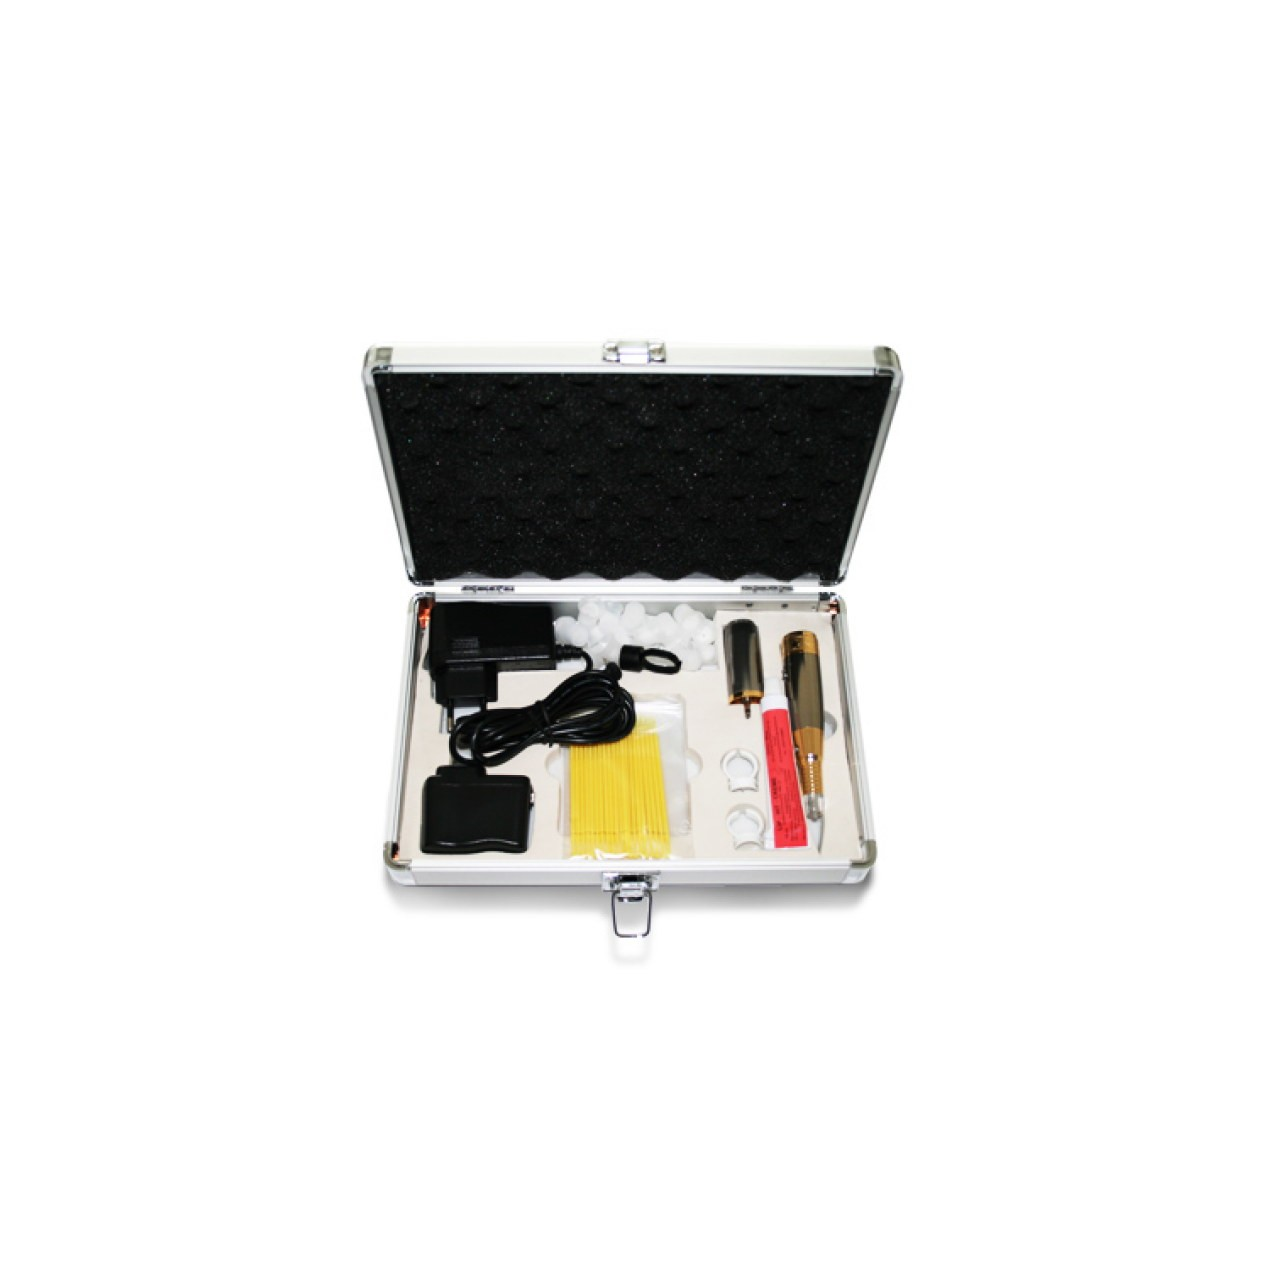 Digitales Prof Gerät Kanagawa Box